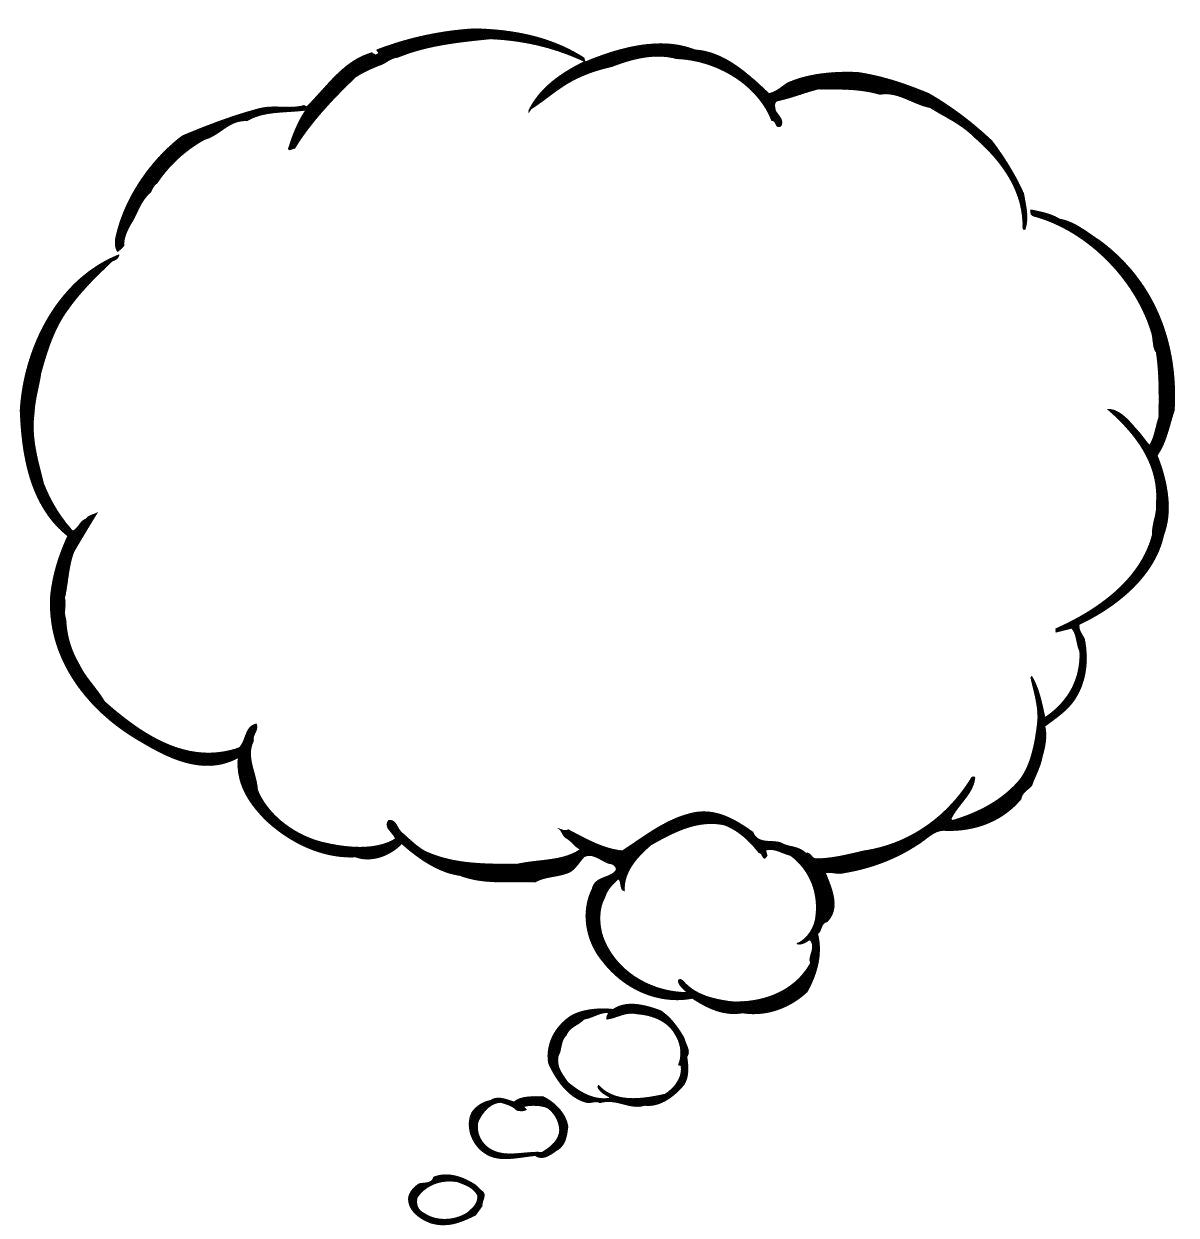 Cartoon Thinking Bubbles | Free download best Cartoon Thinking ... jpg stock